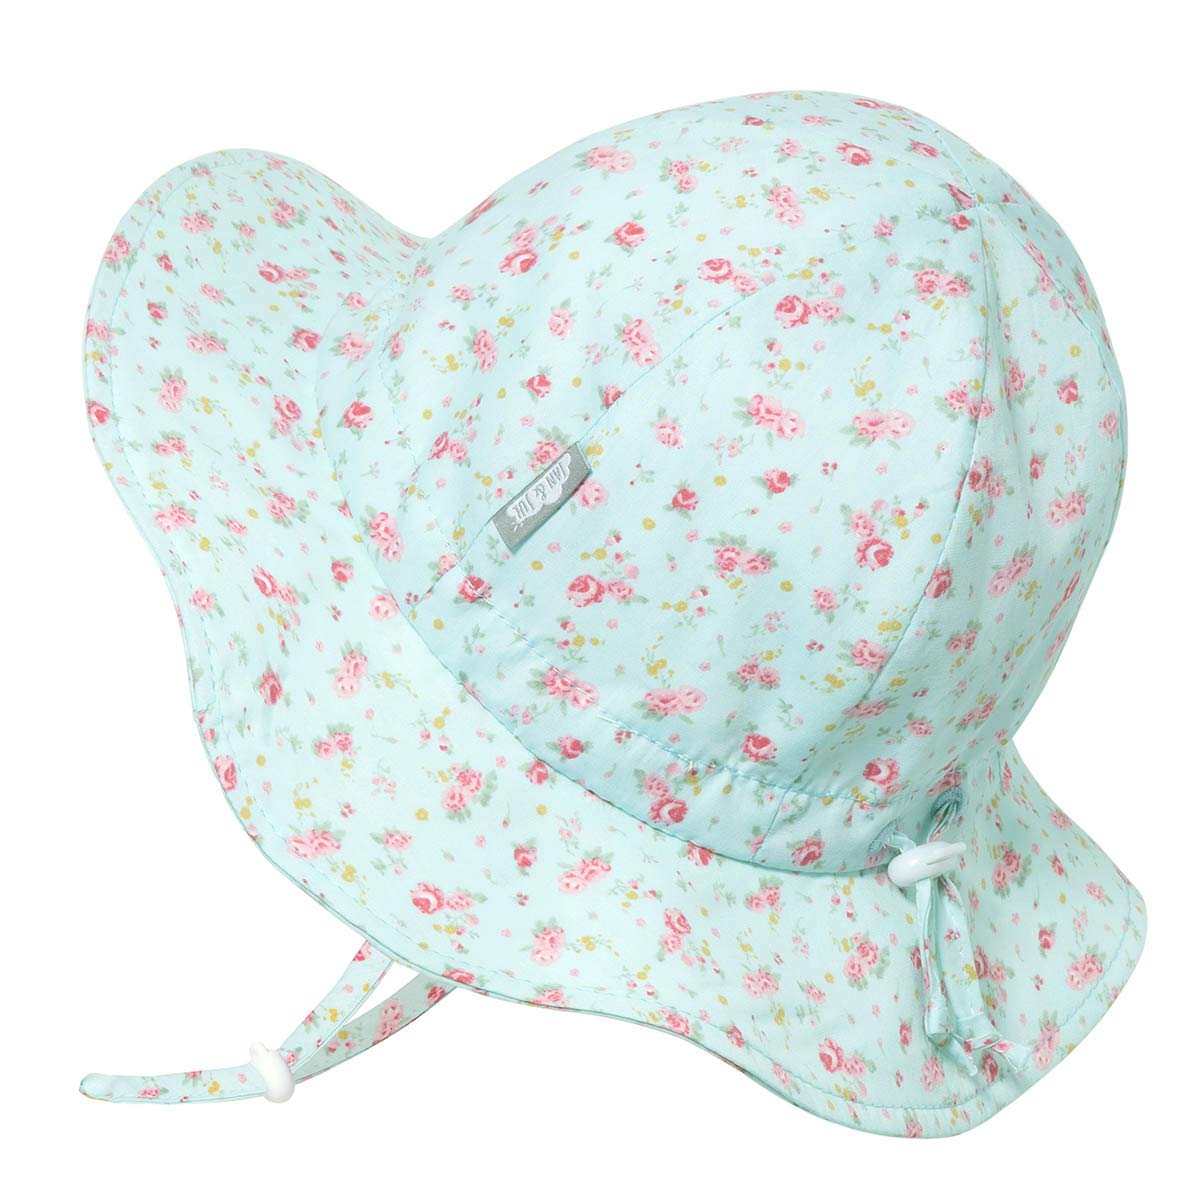 50+UPF Protection Adjustable Strap JAN /& JUL Kids Cotton Bucket Sun-Hat Baby Toddler Girls